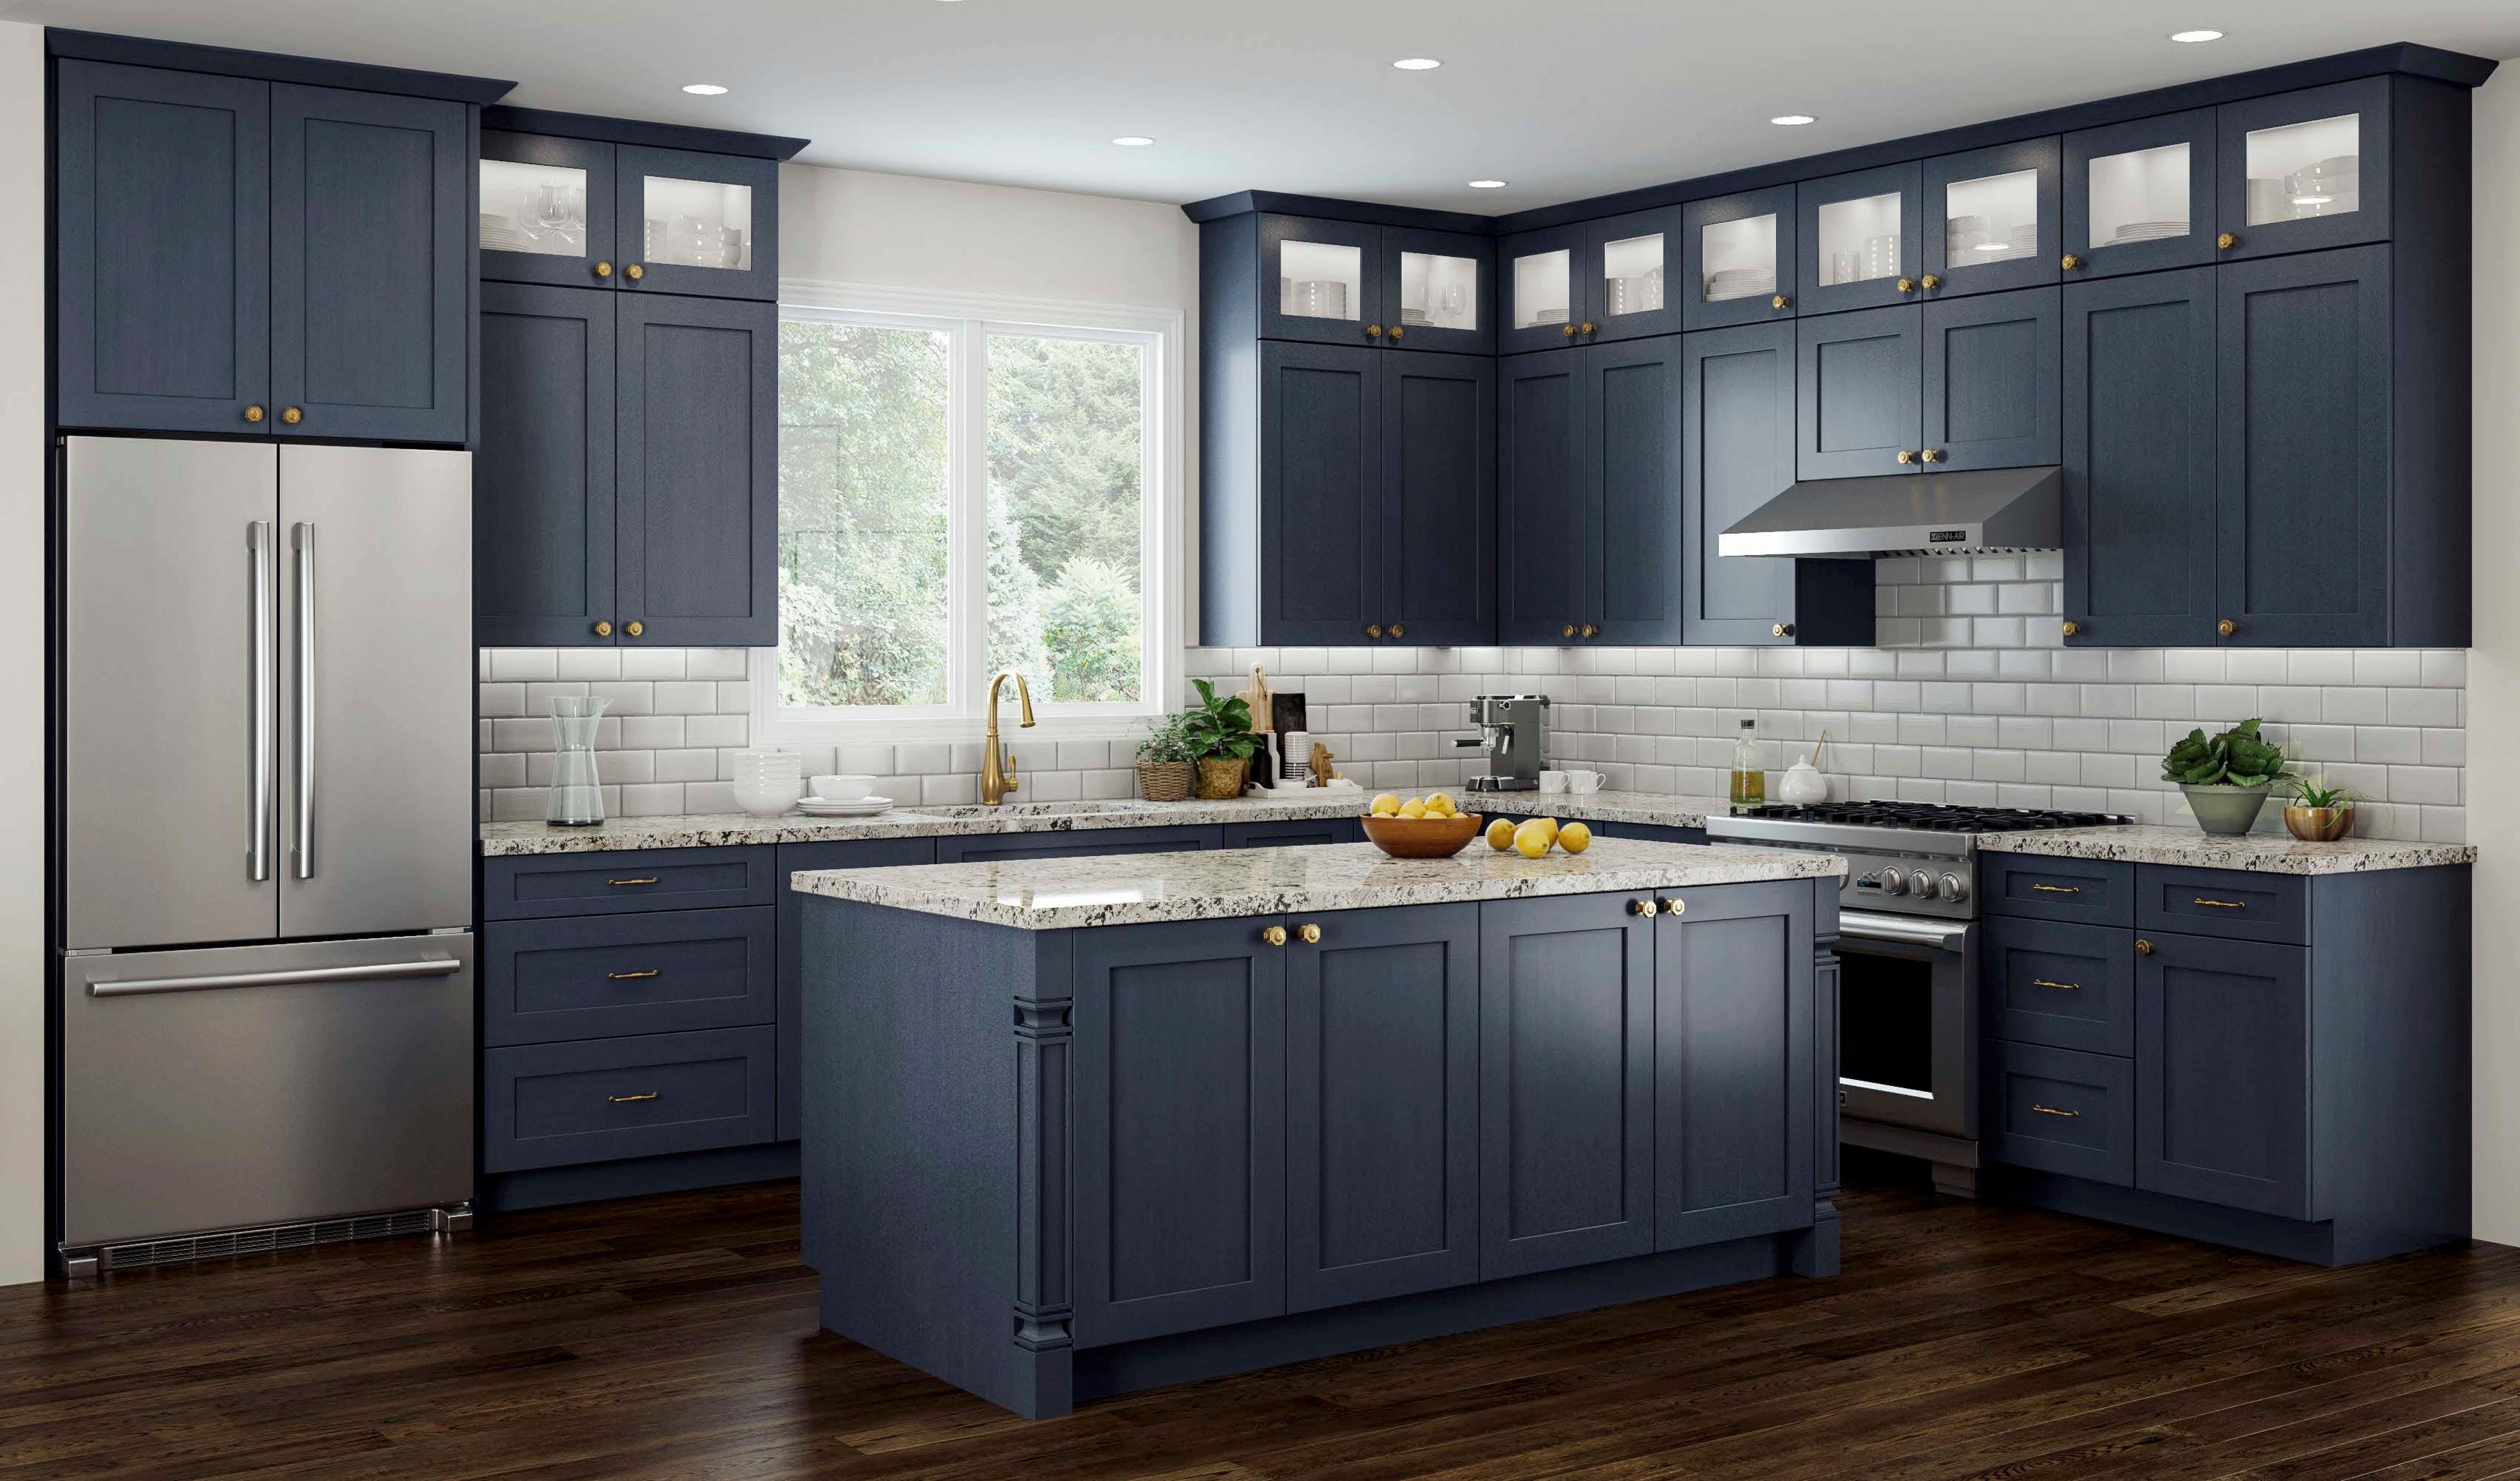 Ocean Blue Stain New From Cnc Cabinetry Shown Here On The Elegant Full Overlay Shaker D Shaker Kitchen Cabinets Refacing Kitchen Cabinets Blue Shaker Kitchen